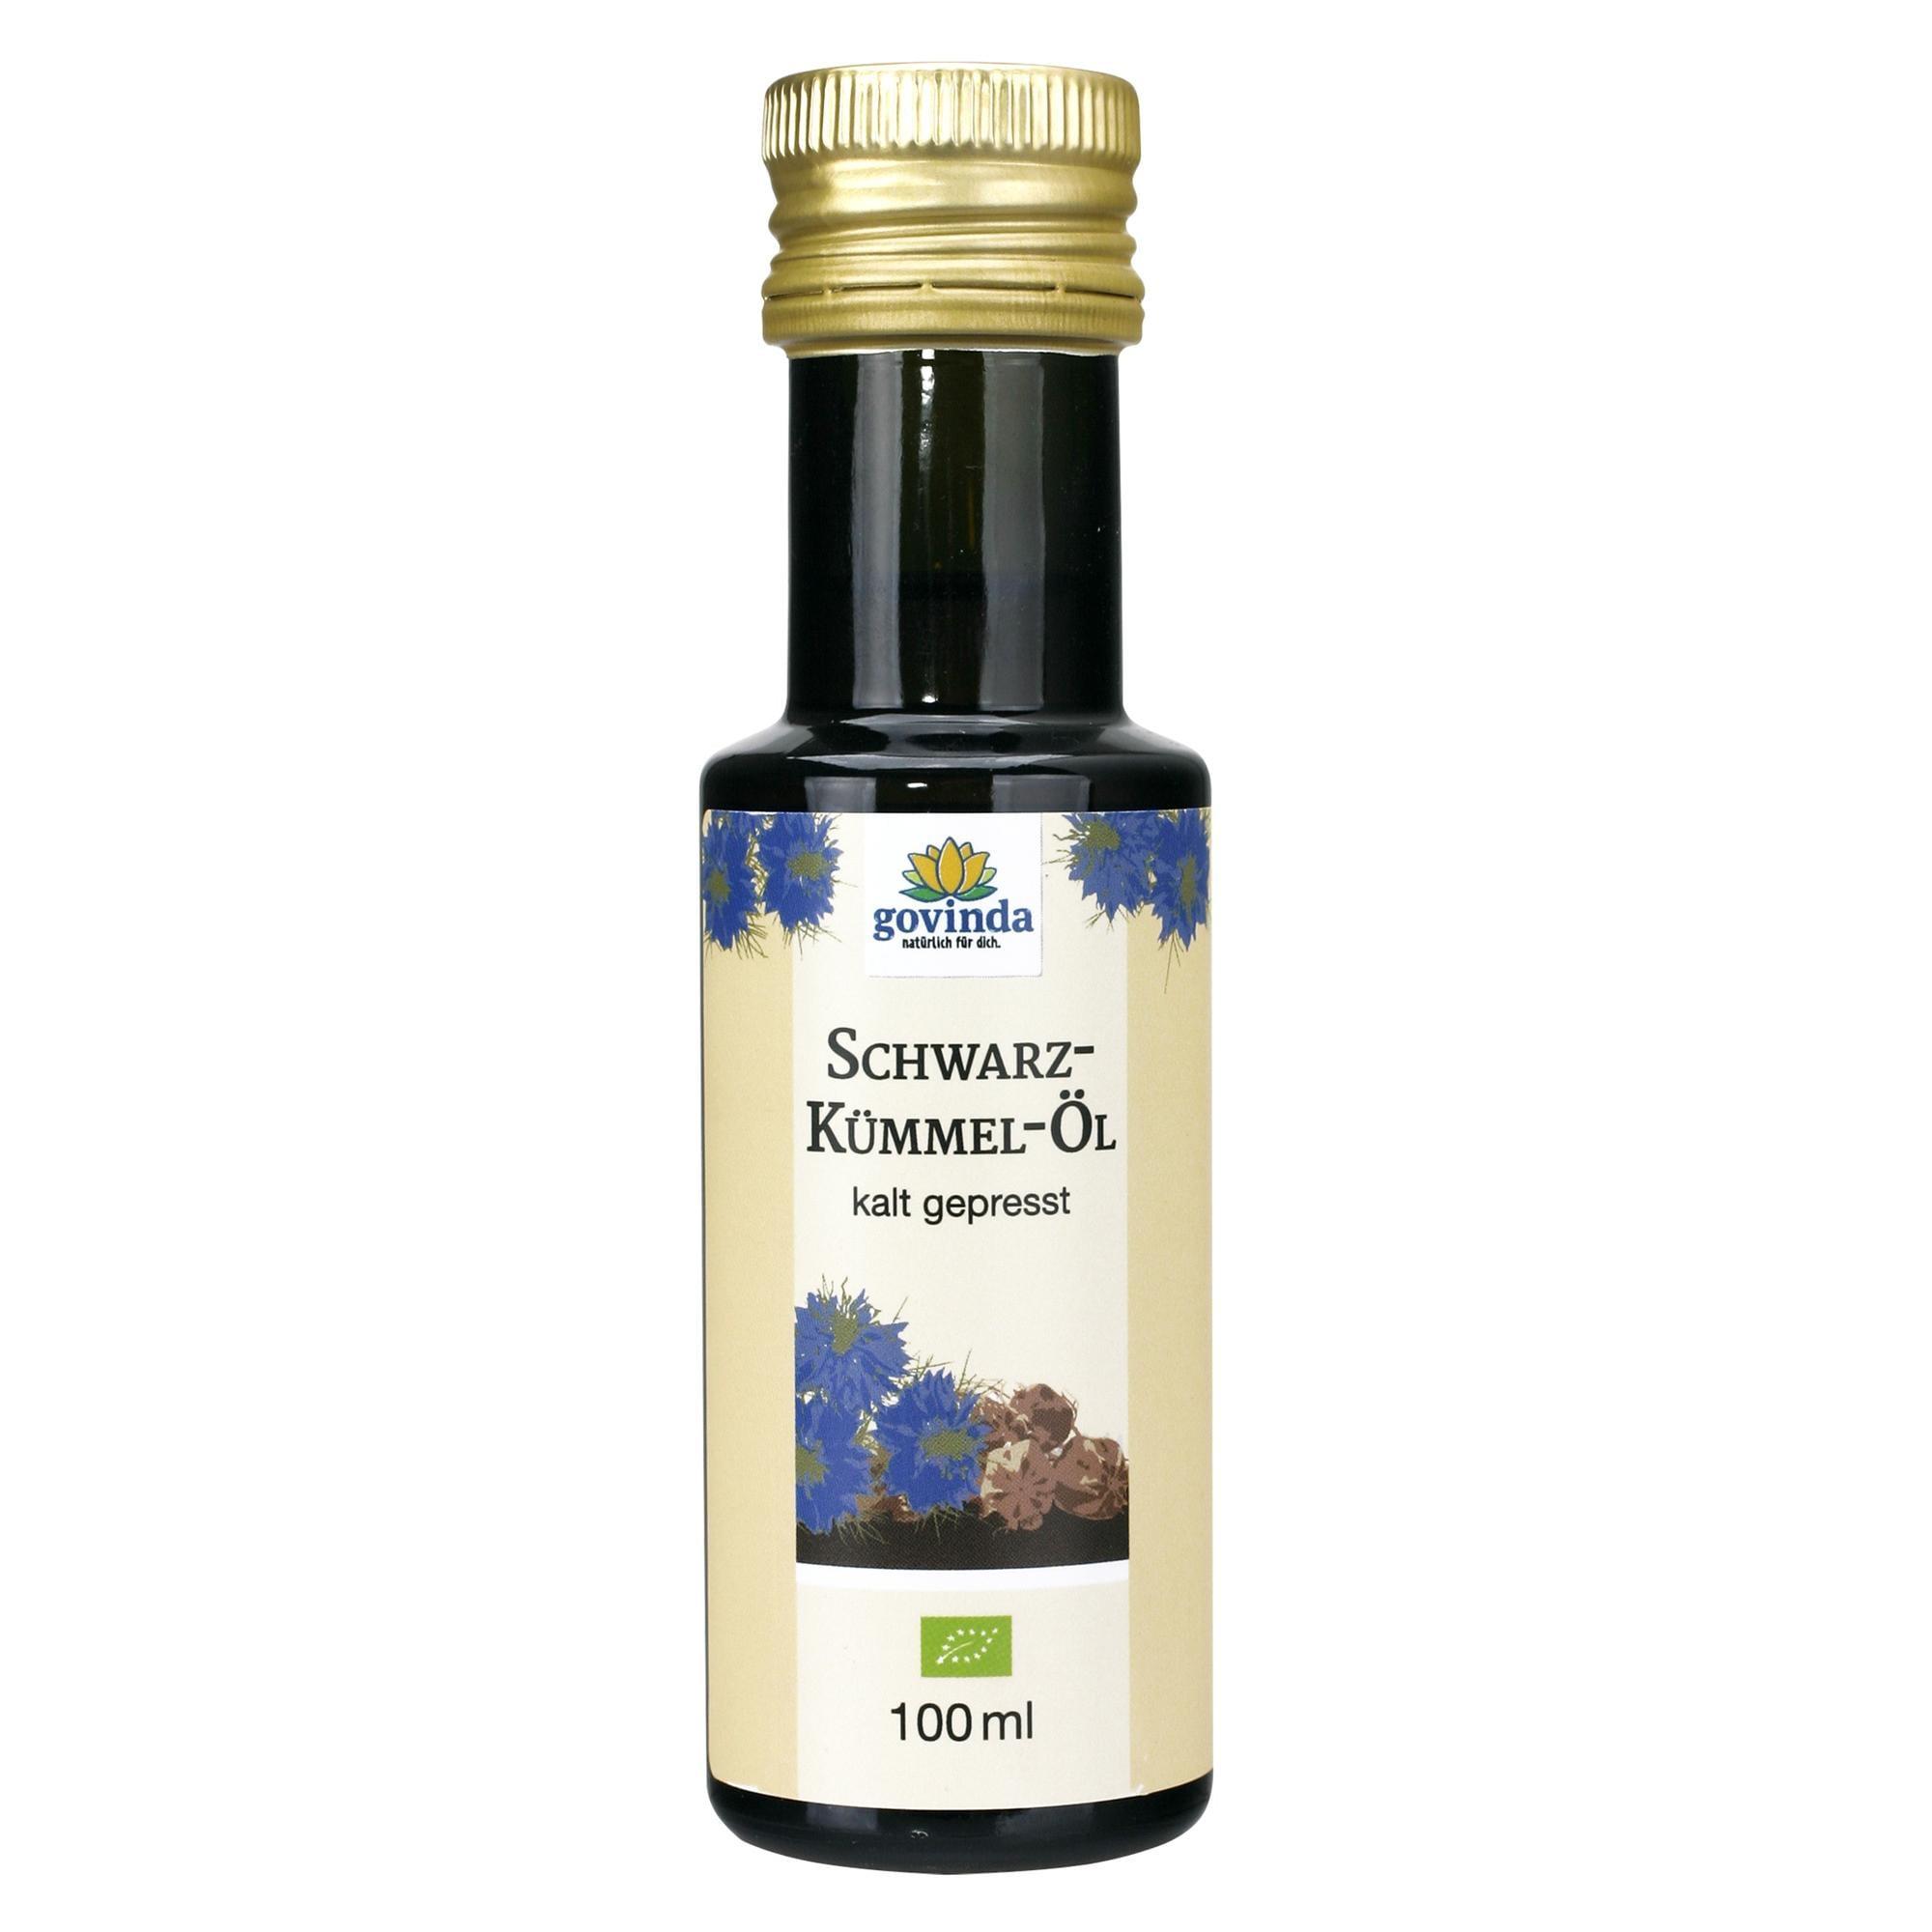 Govinda Bio Schwarzkümmel-Öl kalt gepresst 100 ml